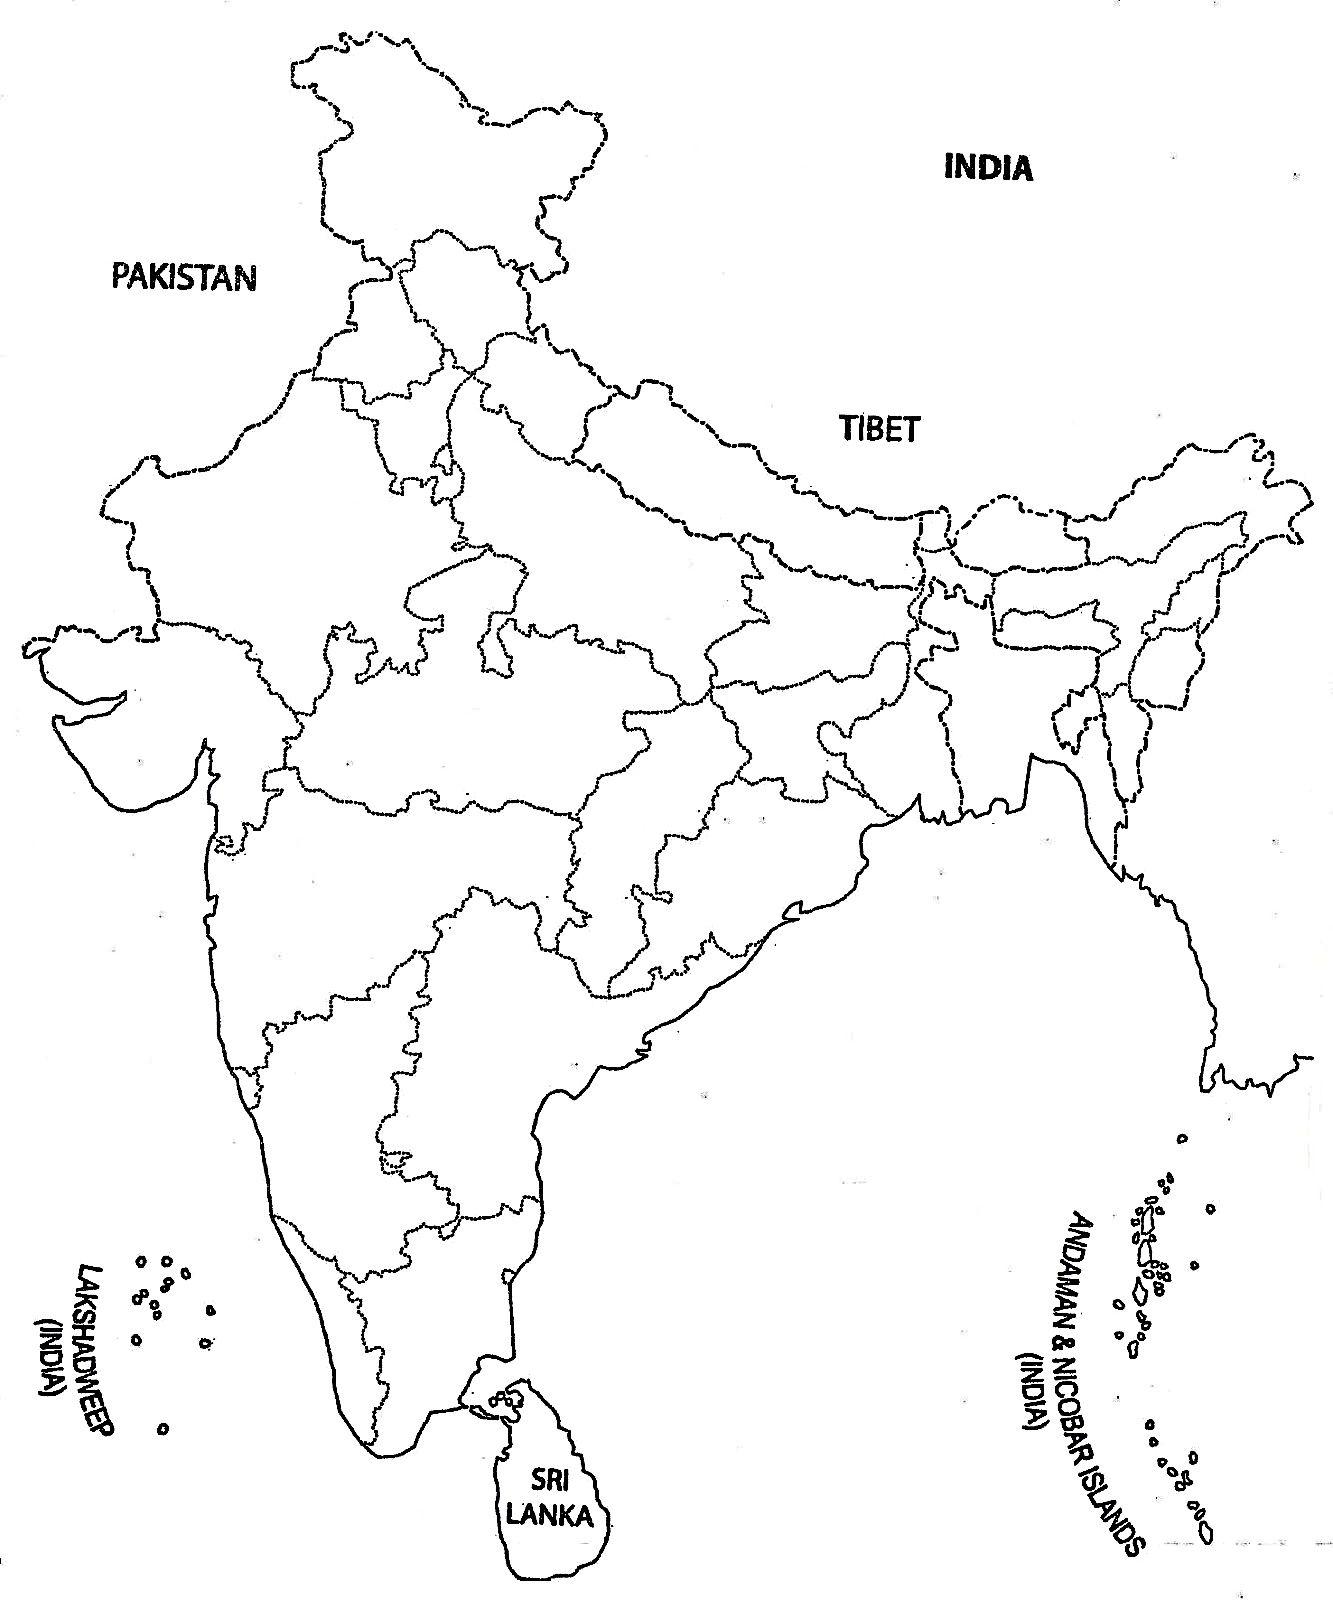 Mahashivratri festival essay